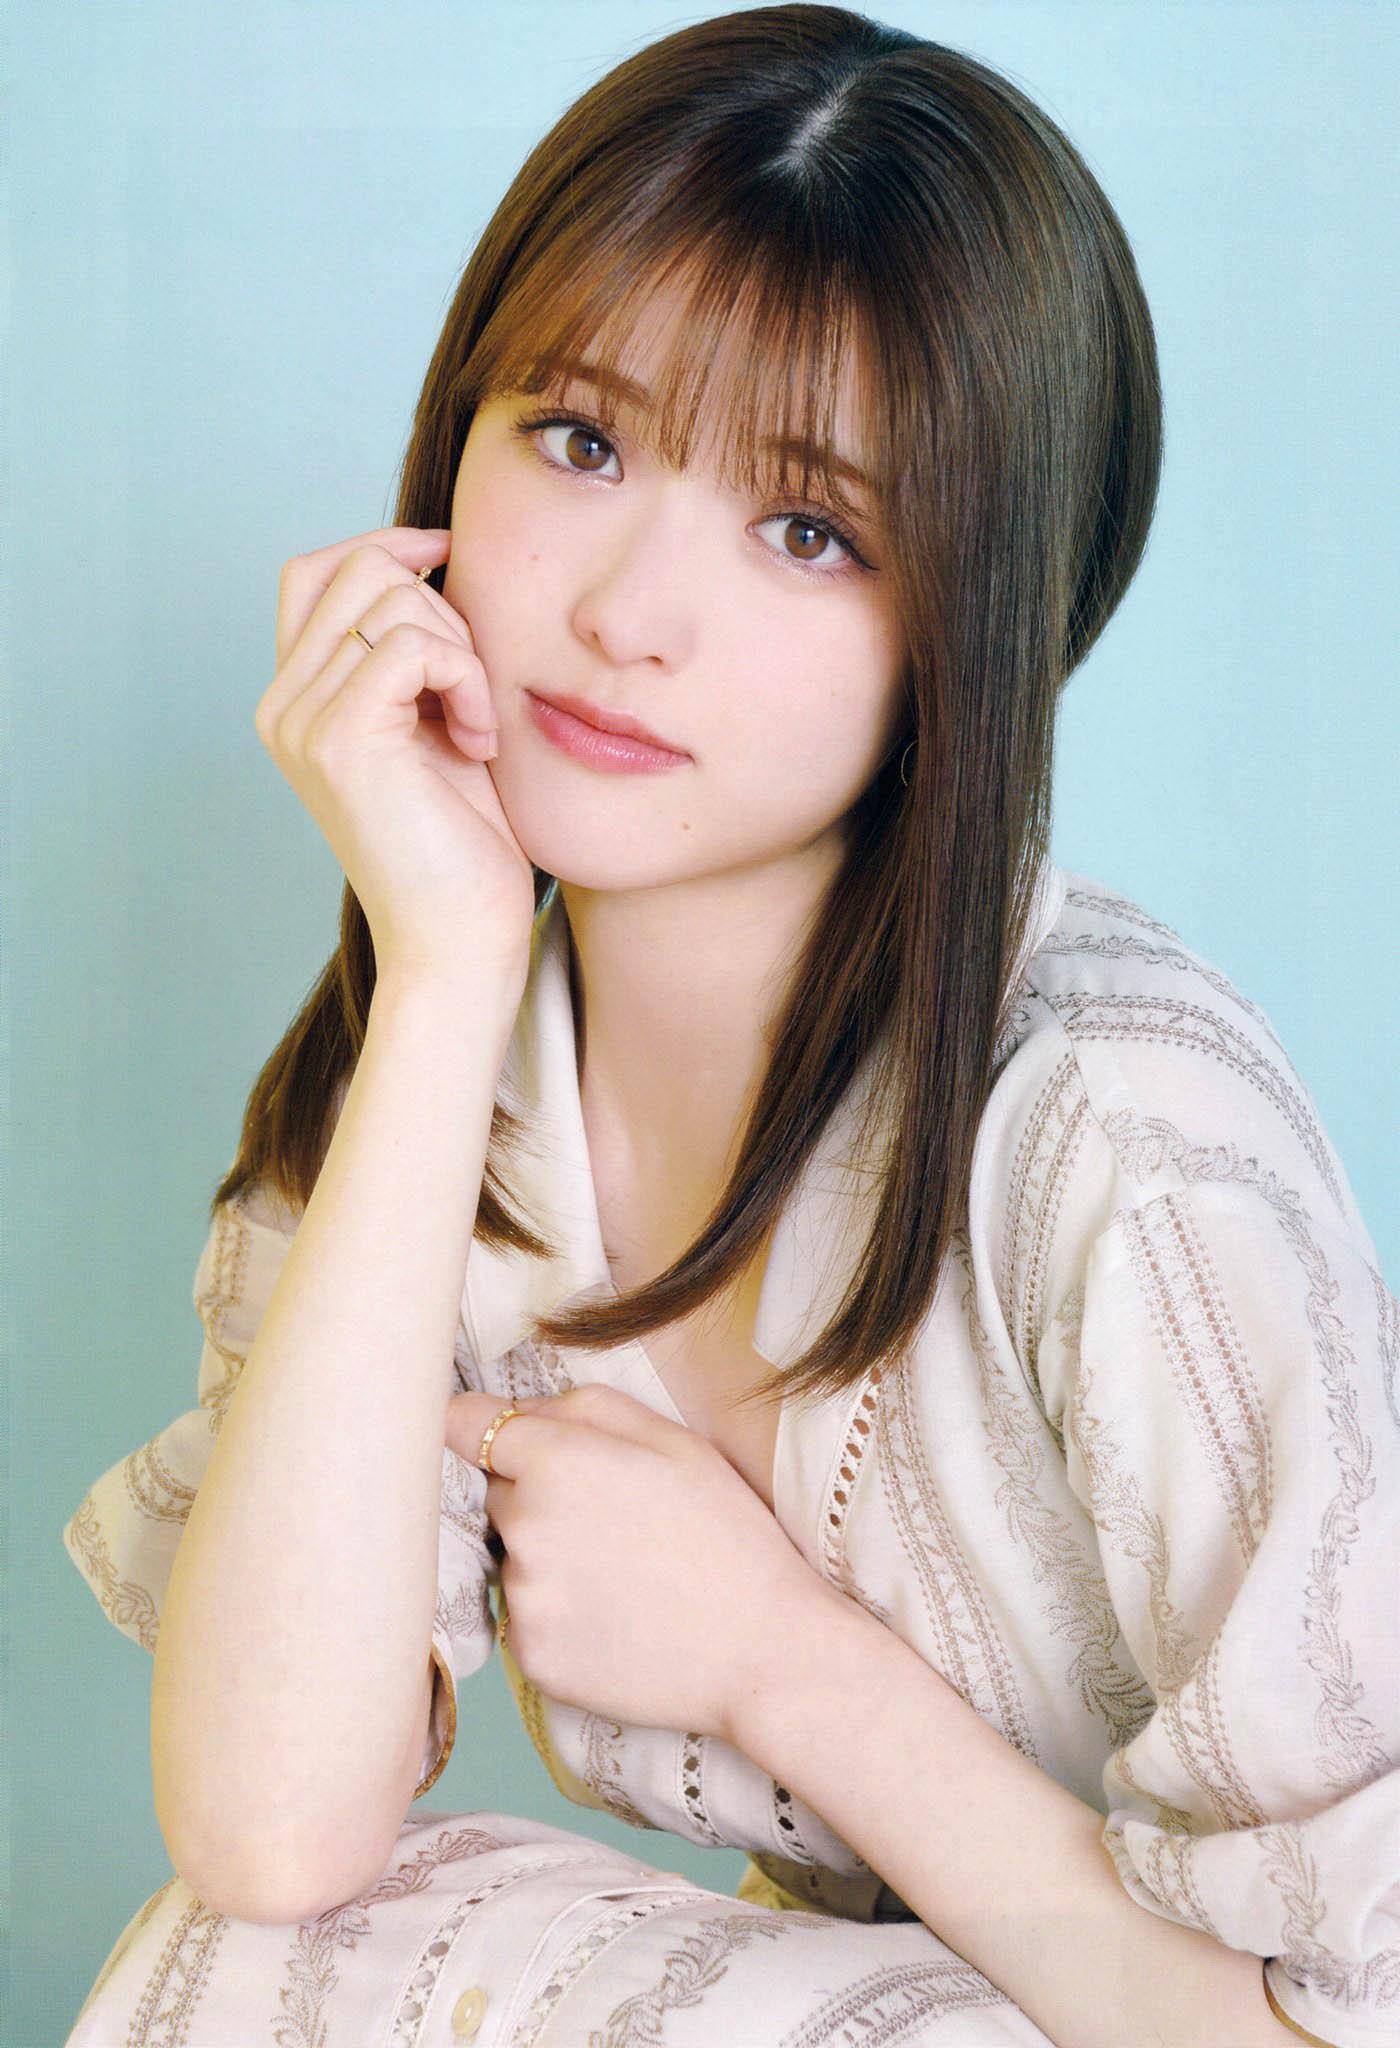 EIkuta SMatsumura Big One Girls 2105 05.jpg